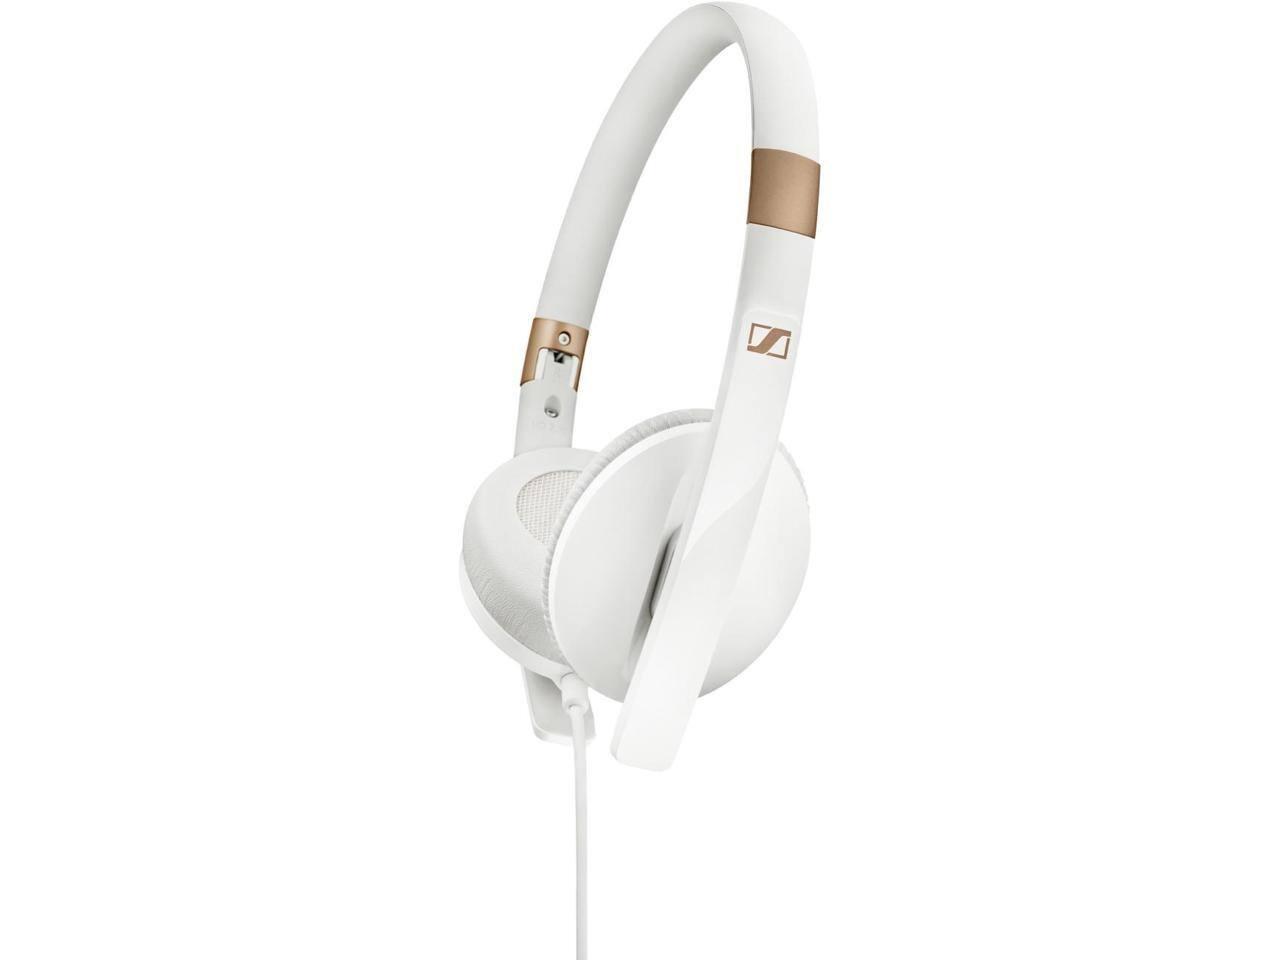 Sennheiser HD 2.30G/2.30i On-Ear Headphones $30 + FS